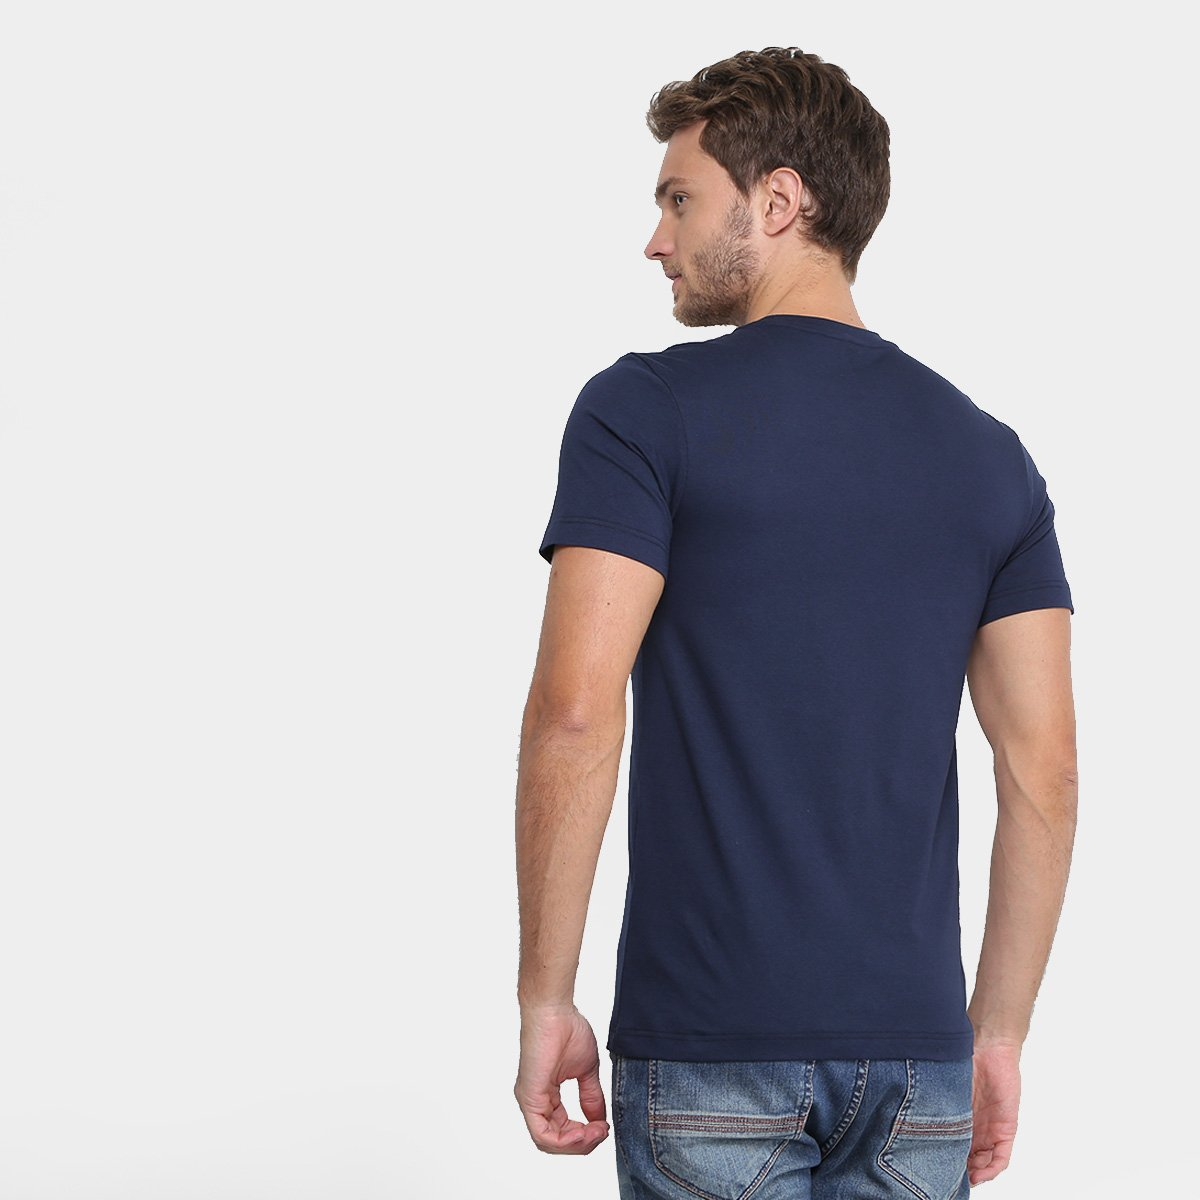 Camiseta Lacoste Astronauta Masculina  Camiseta Lacoste Astronauta  Masculina ... a14a996a8b